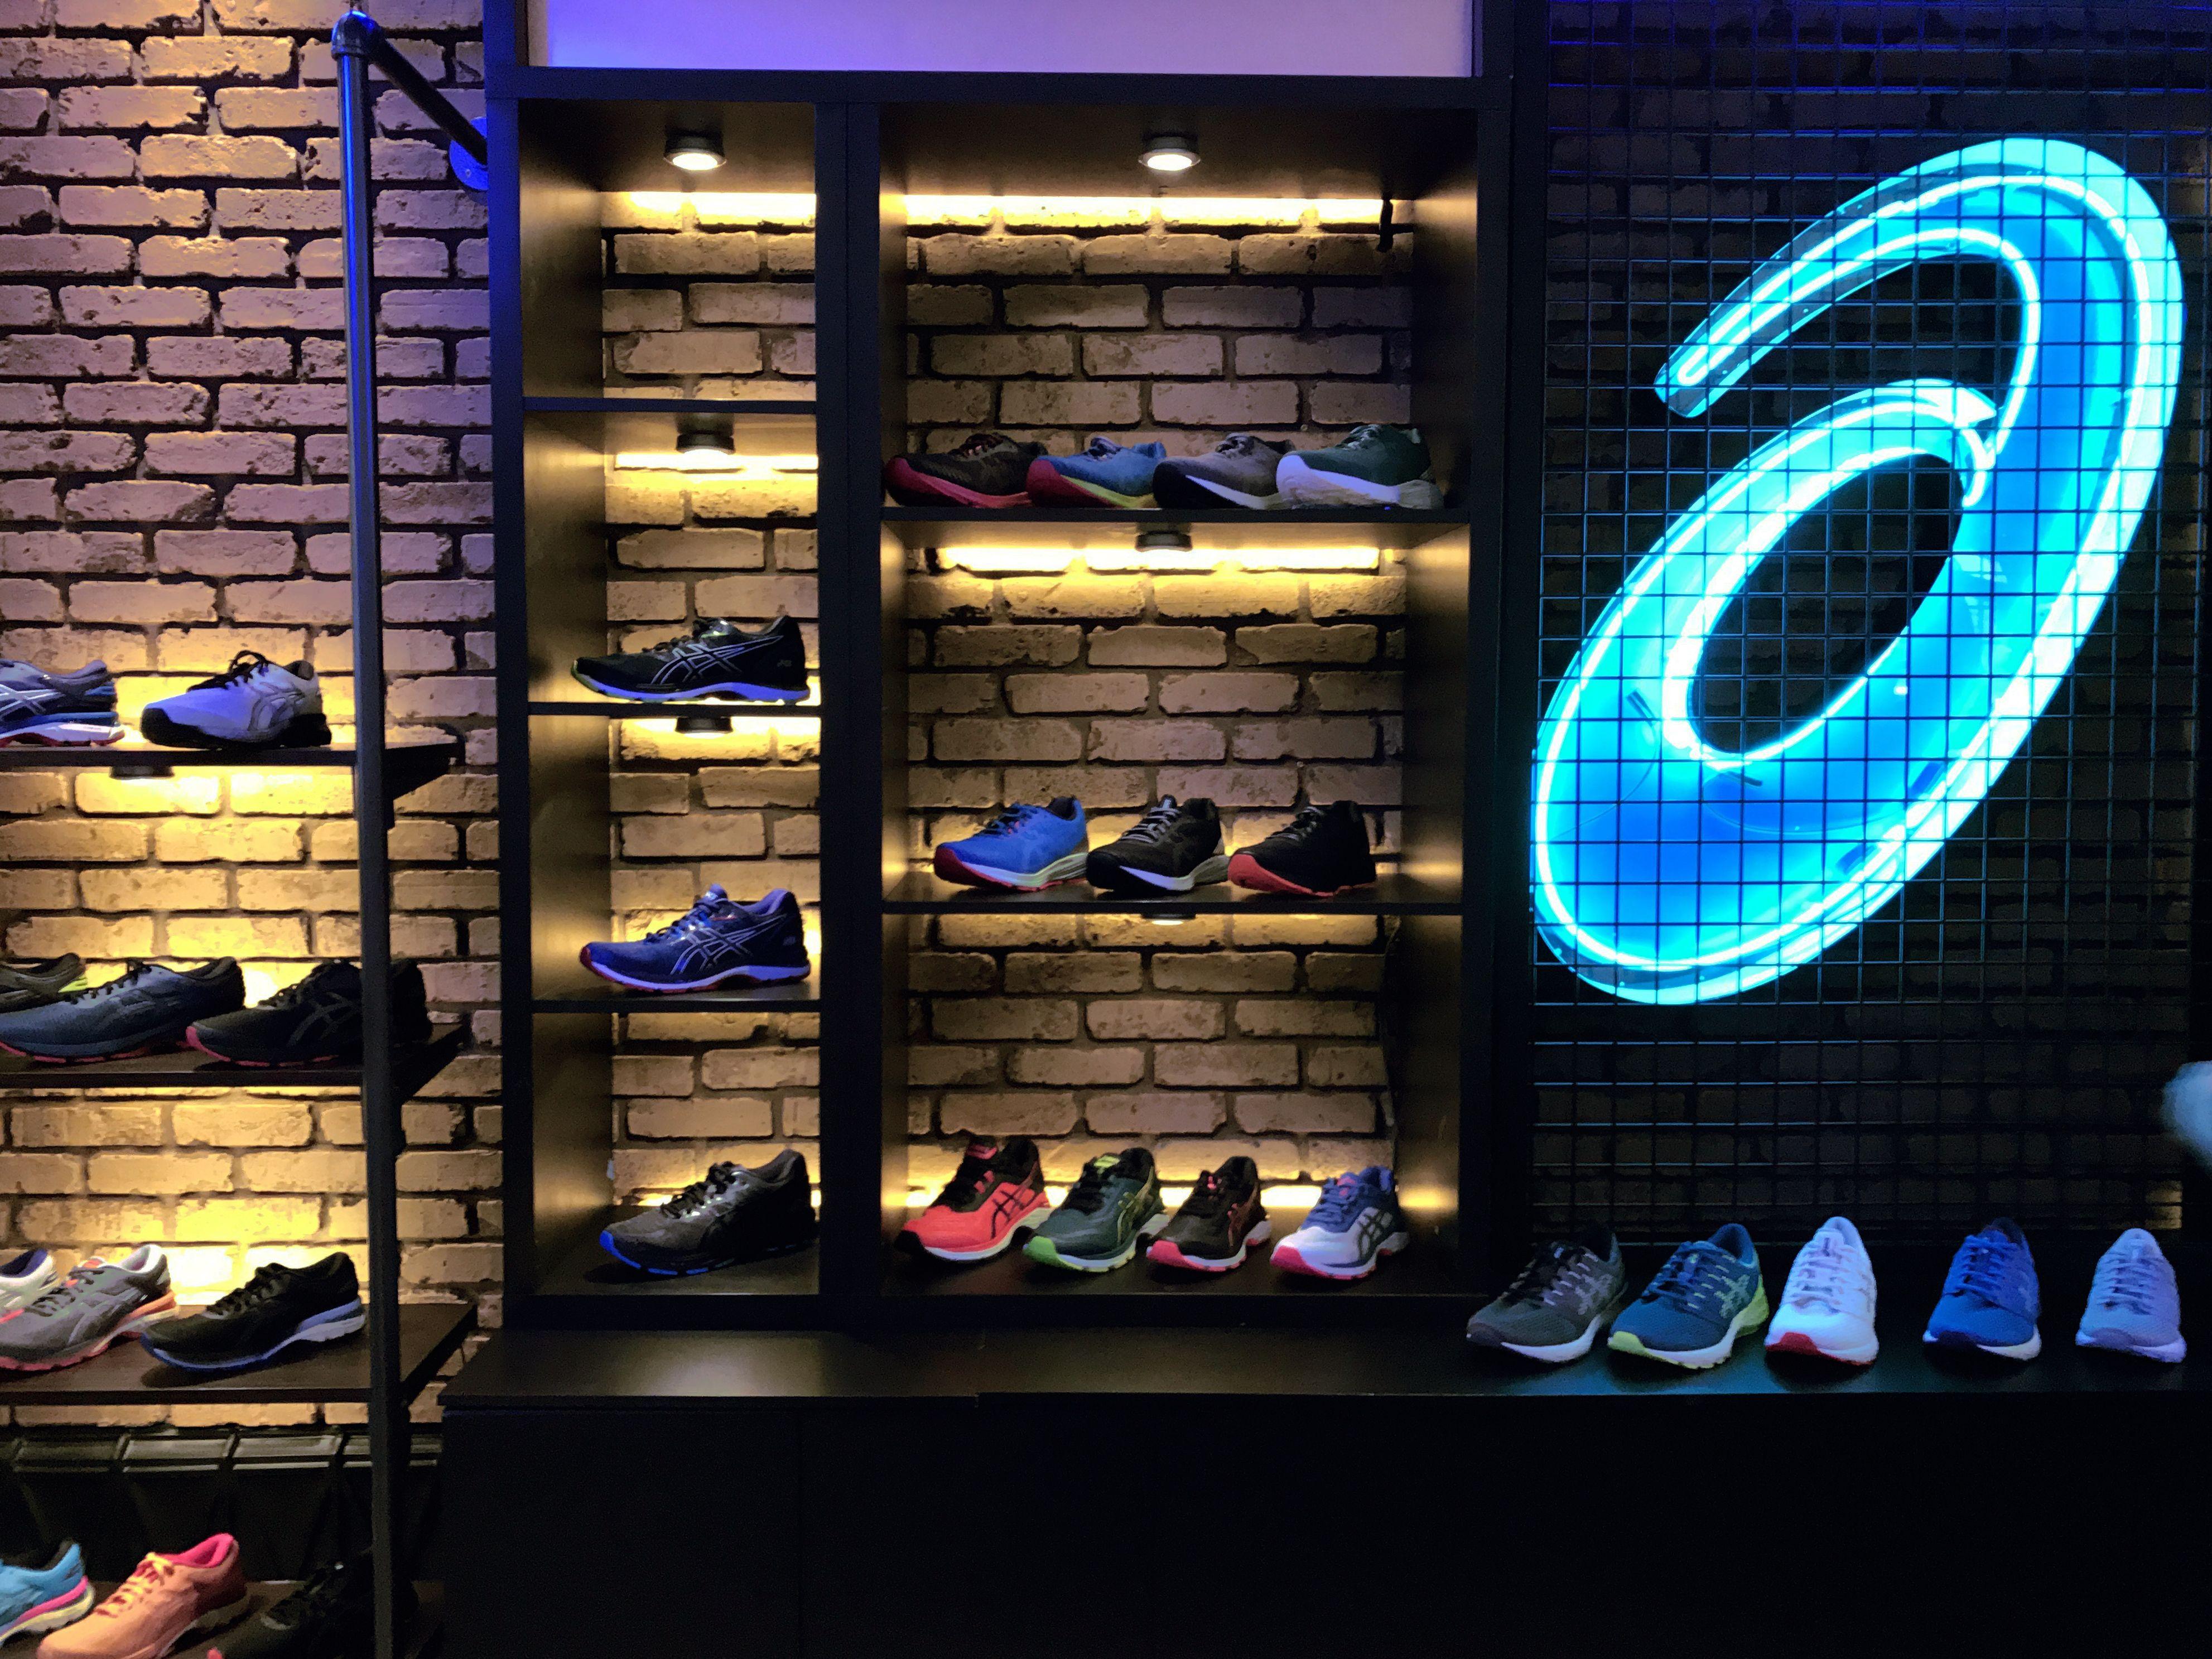 Shoe display at the #ASICS Neon Brewpub